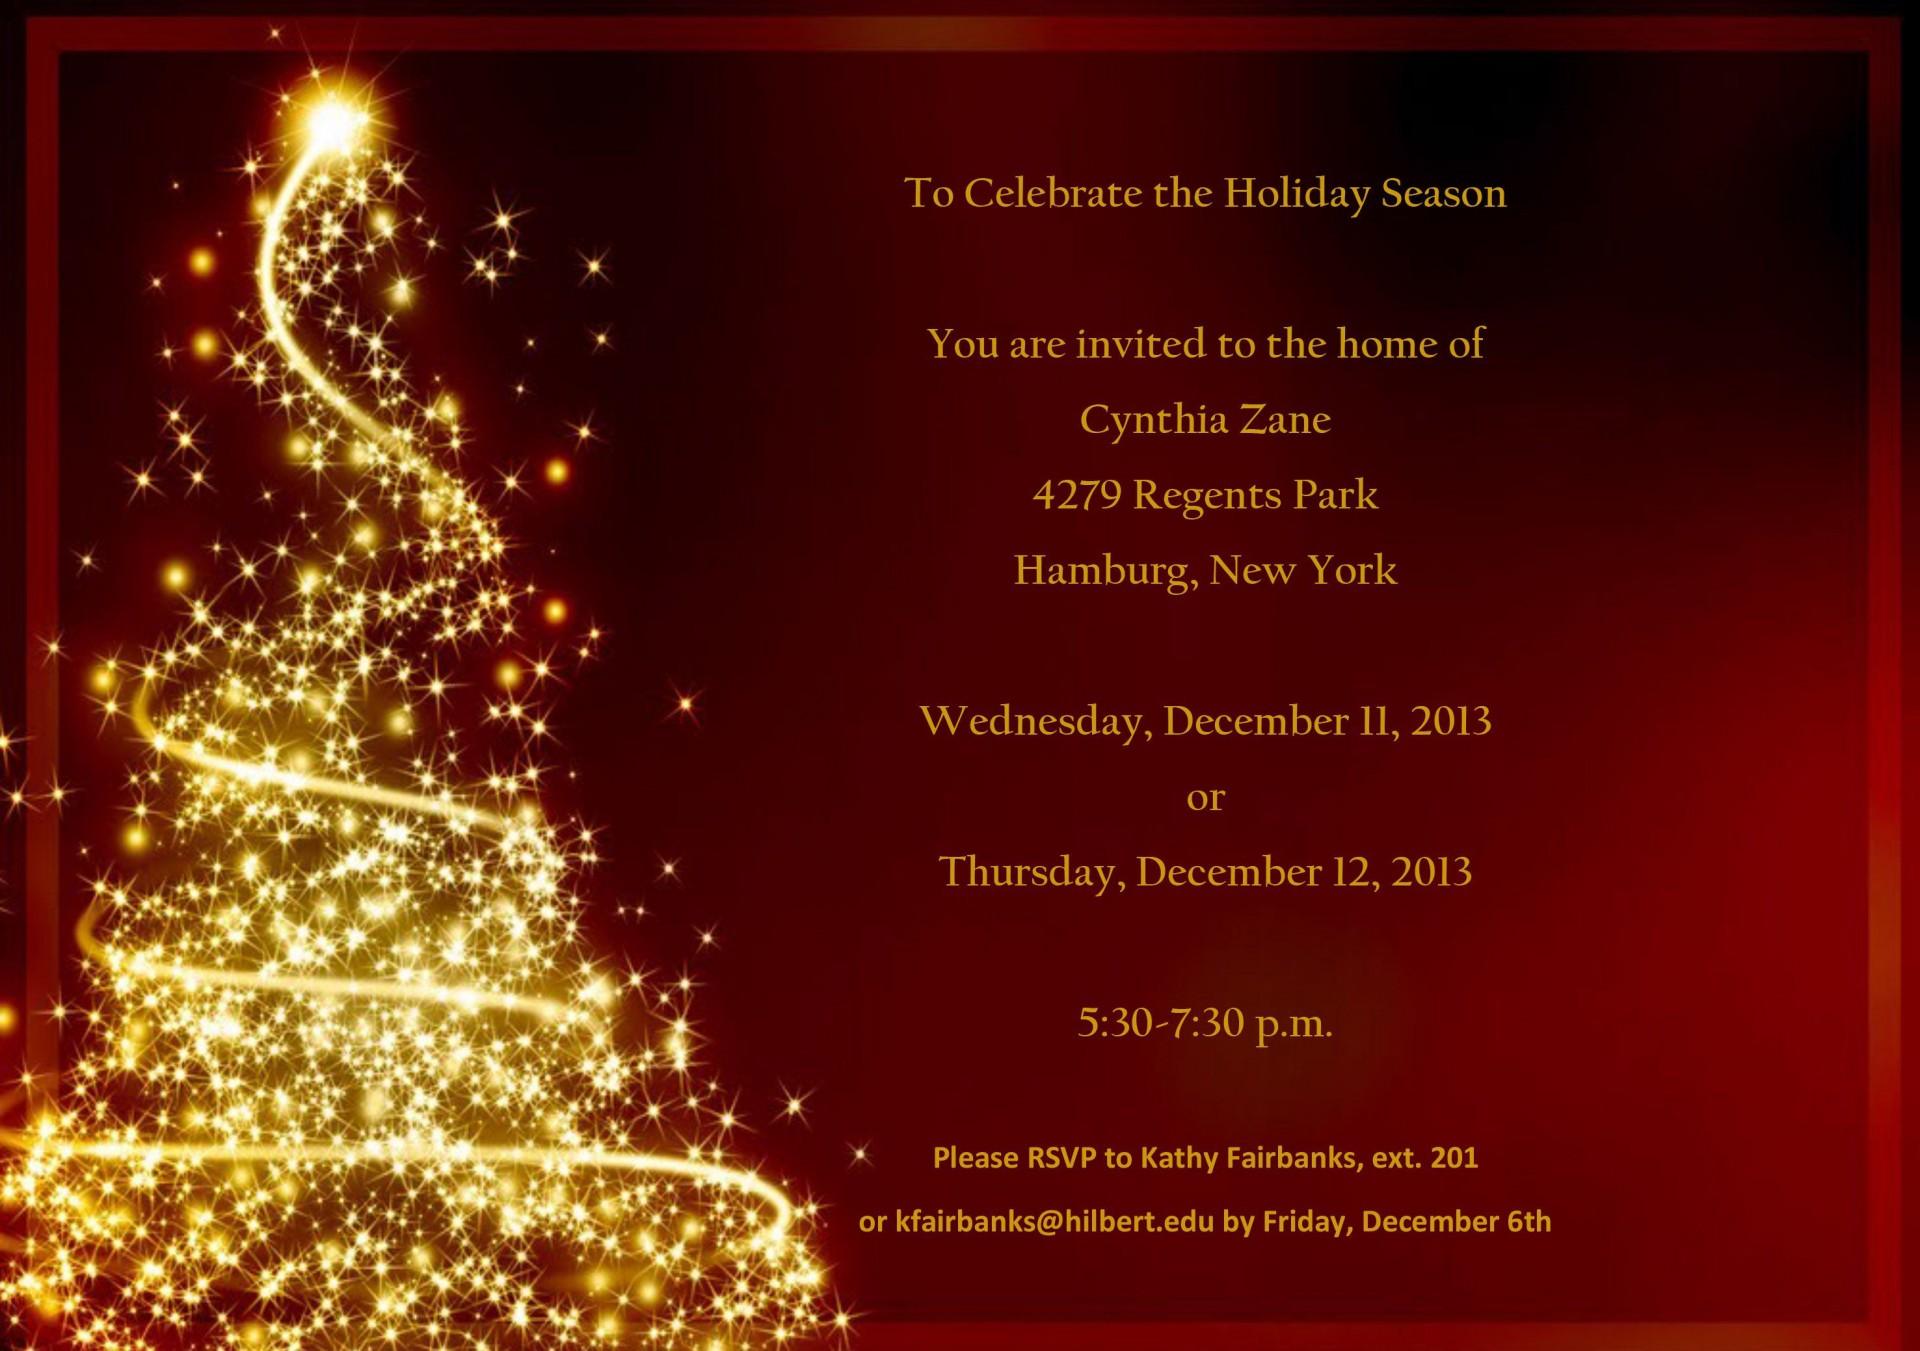 001 Wondrou Free Christma Invitation Template Word High Resolution  Holiday Party Editable1920